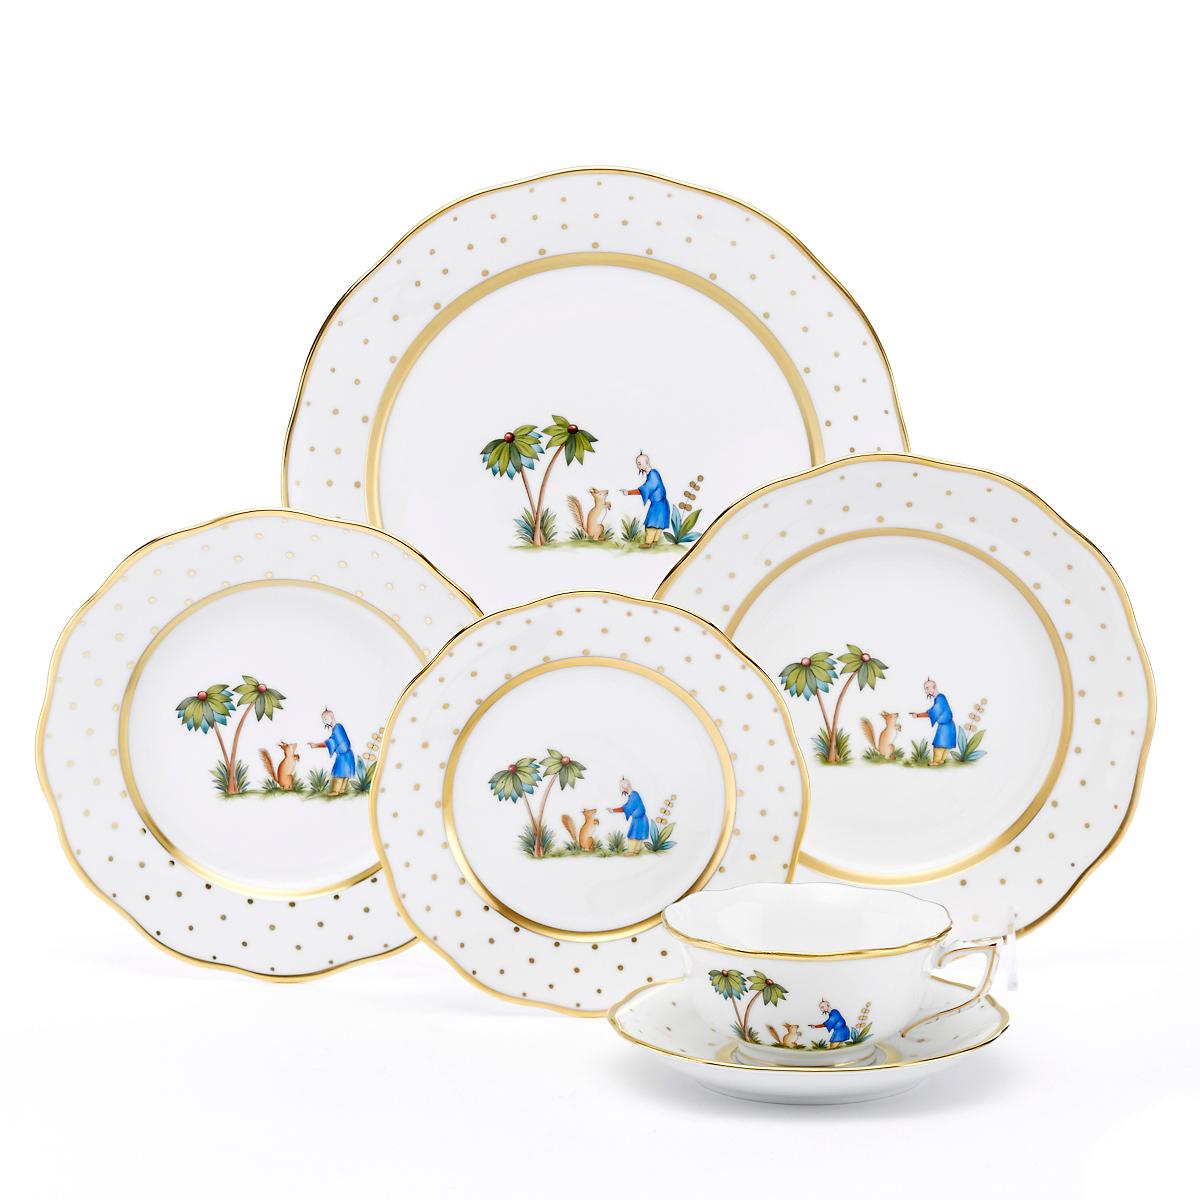 Herend Asian Garden Dinnerware Motif 3  sc 1 st  Gump\u0027s & Herend Asian Garden Dinnerware Motif 3 | Gump\u0027s